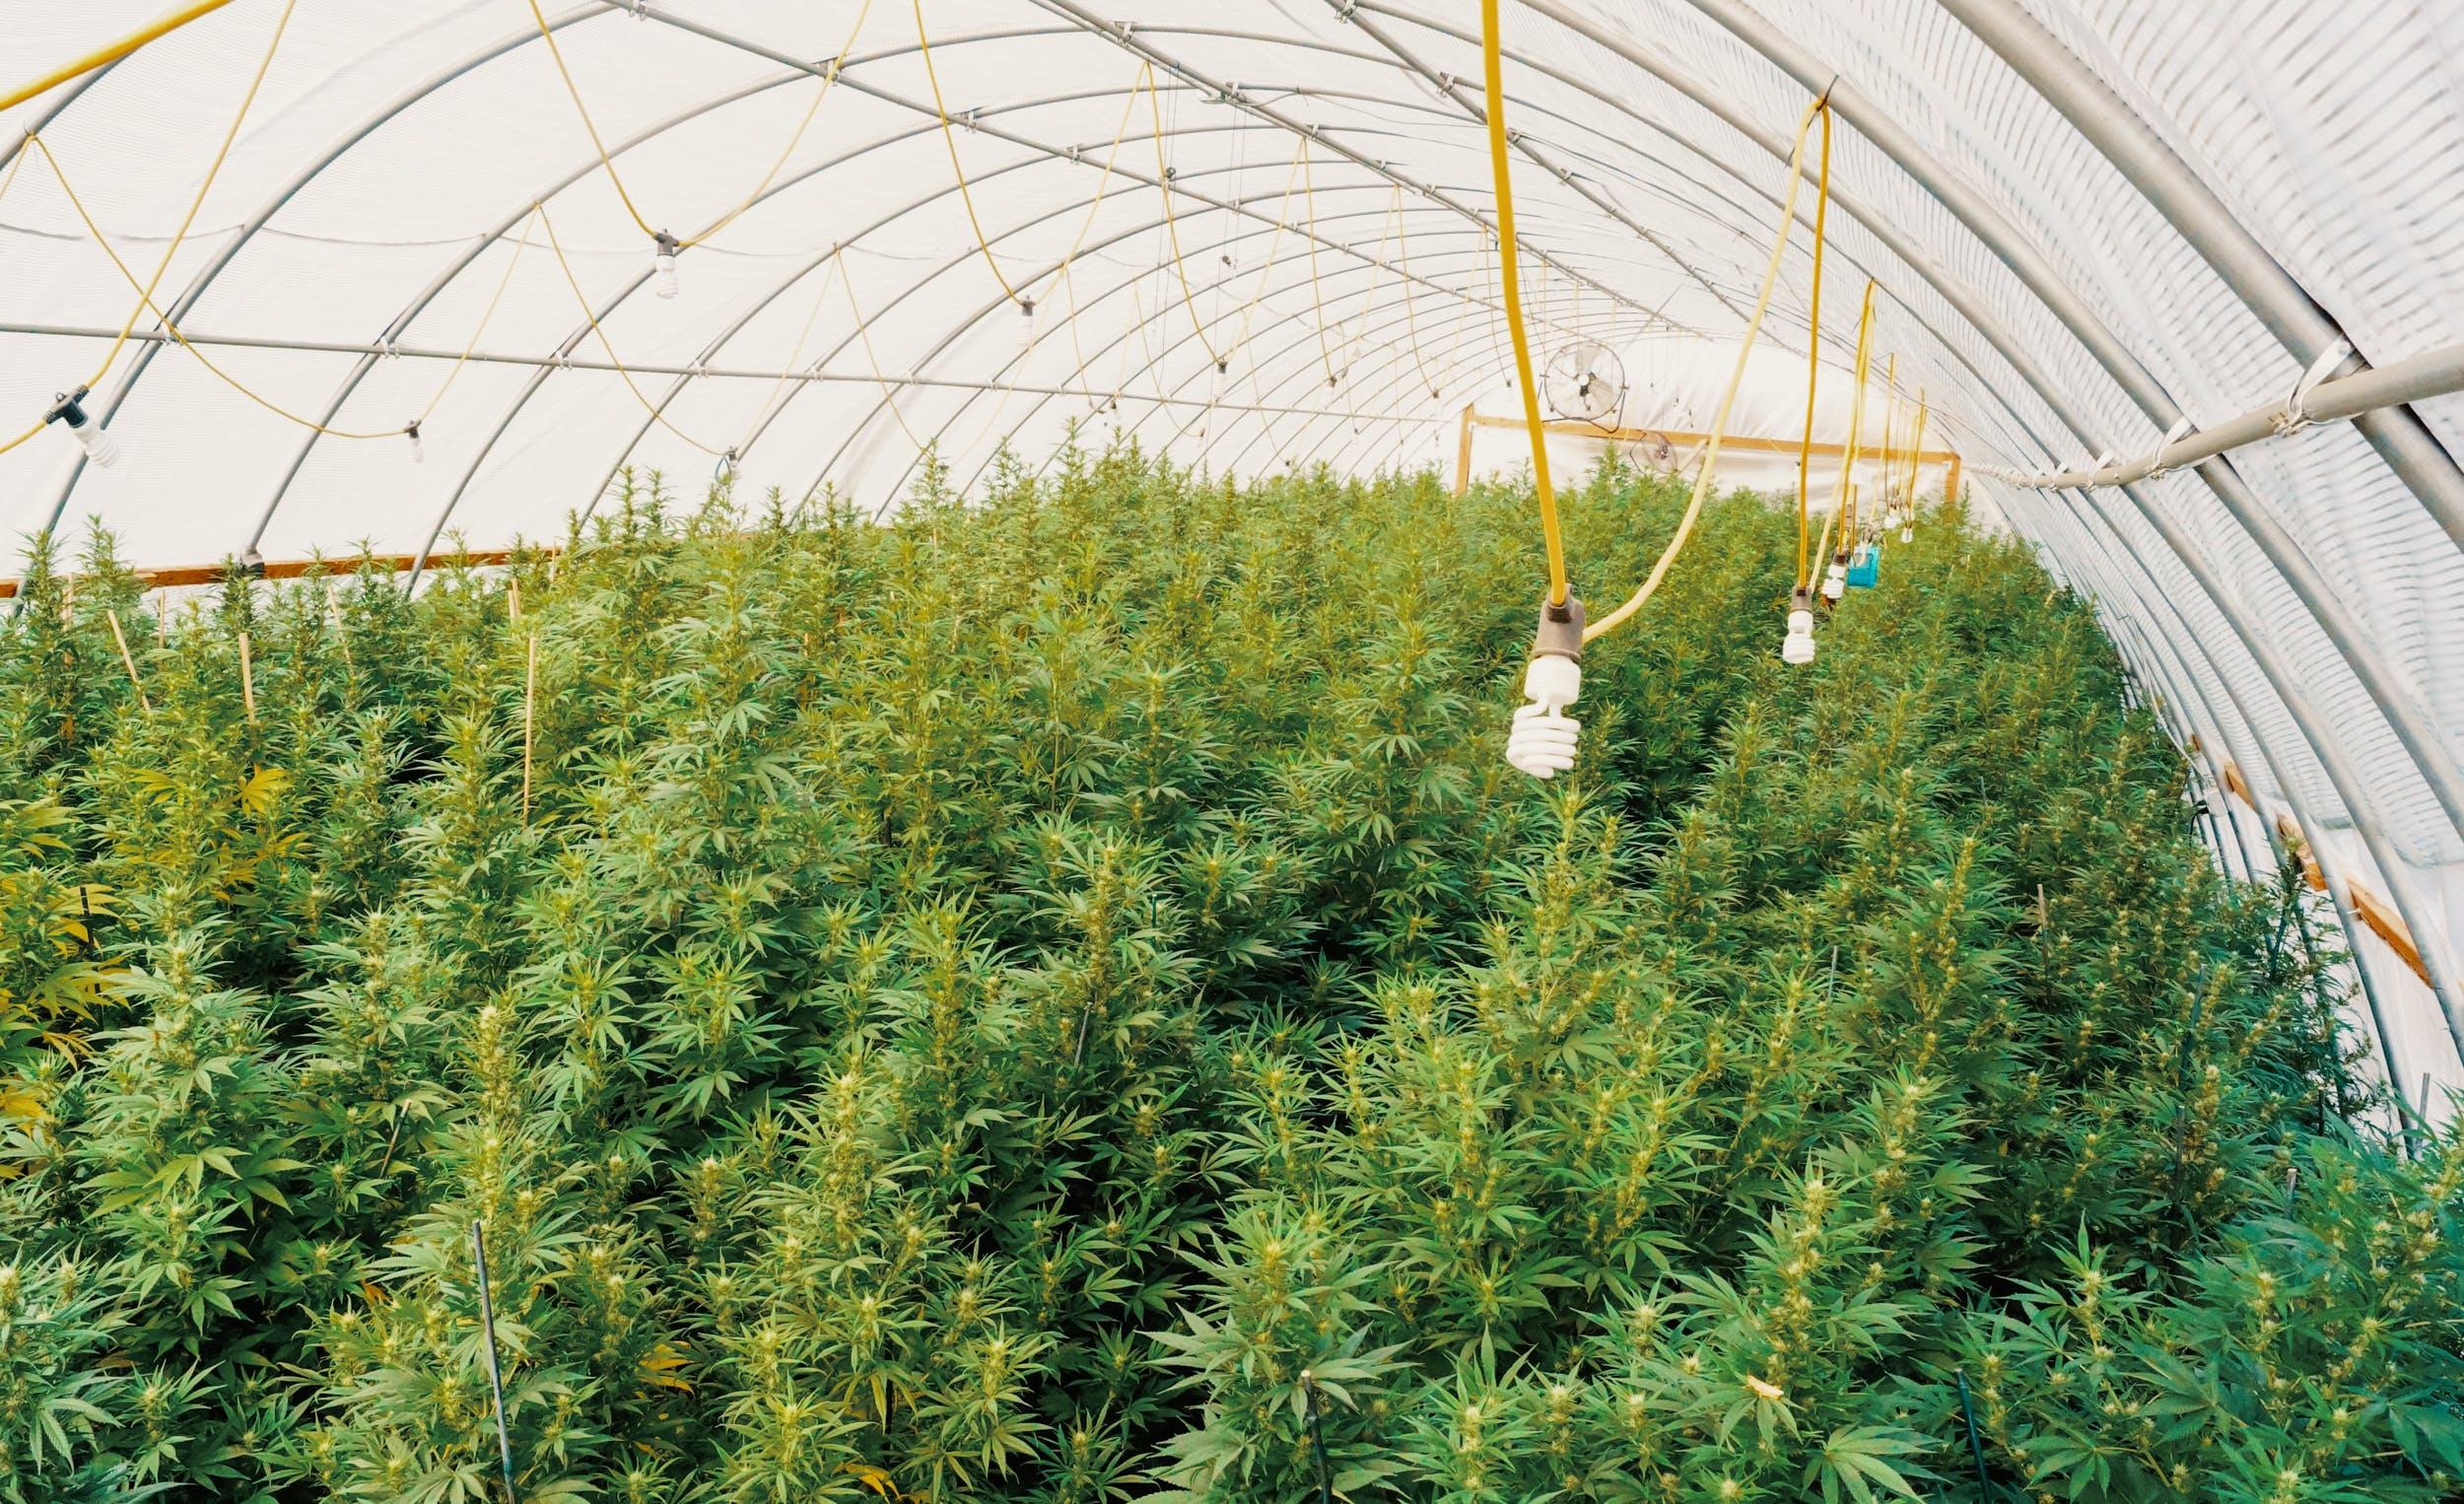 A large scale hemp farm under a dome